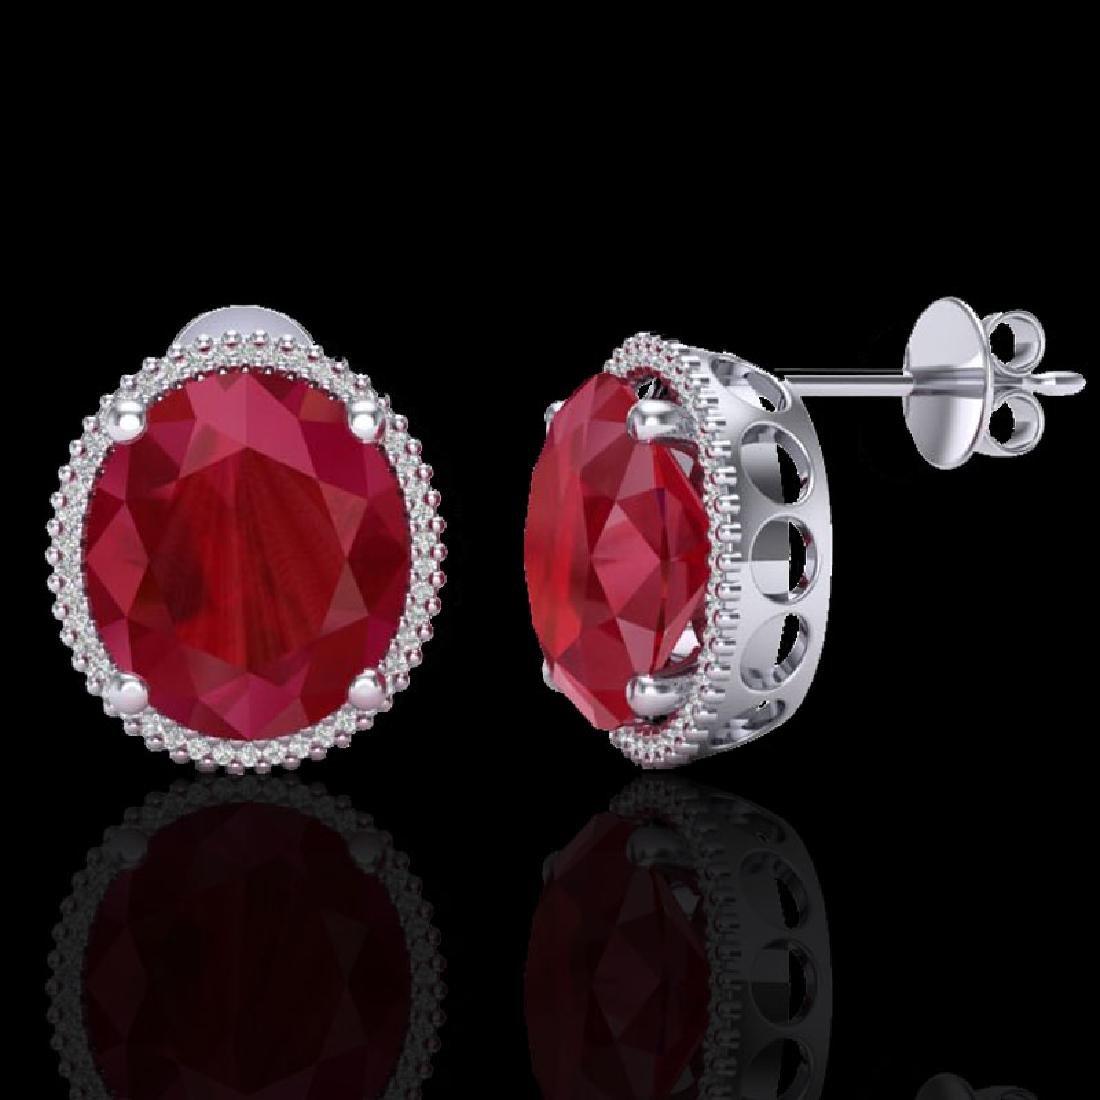 25 CTW Ruby & Micro Pave VS/SI Diamond Halo Earrings - 2